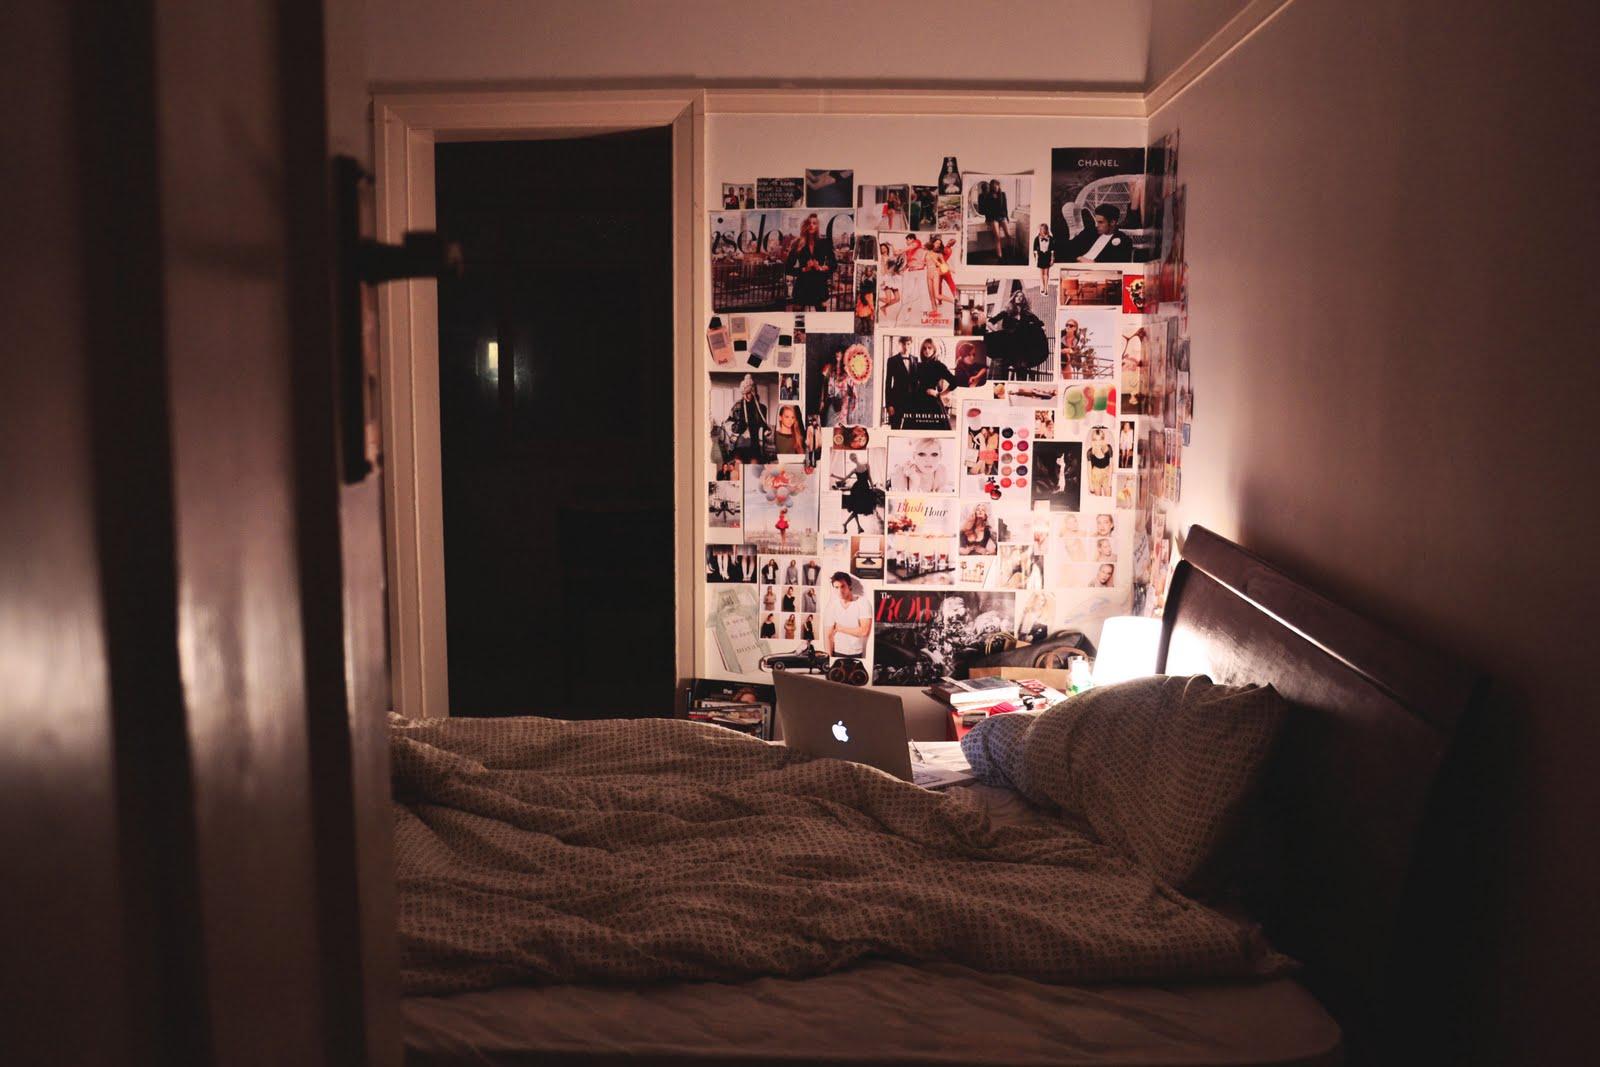 Polly already has a photo wall in